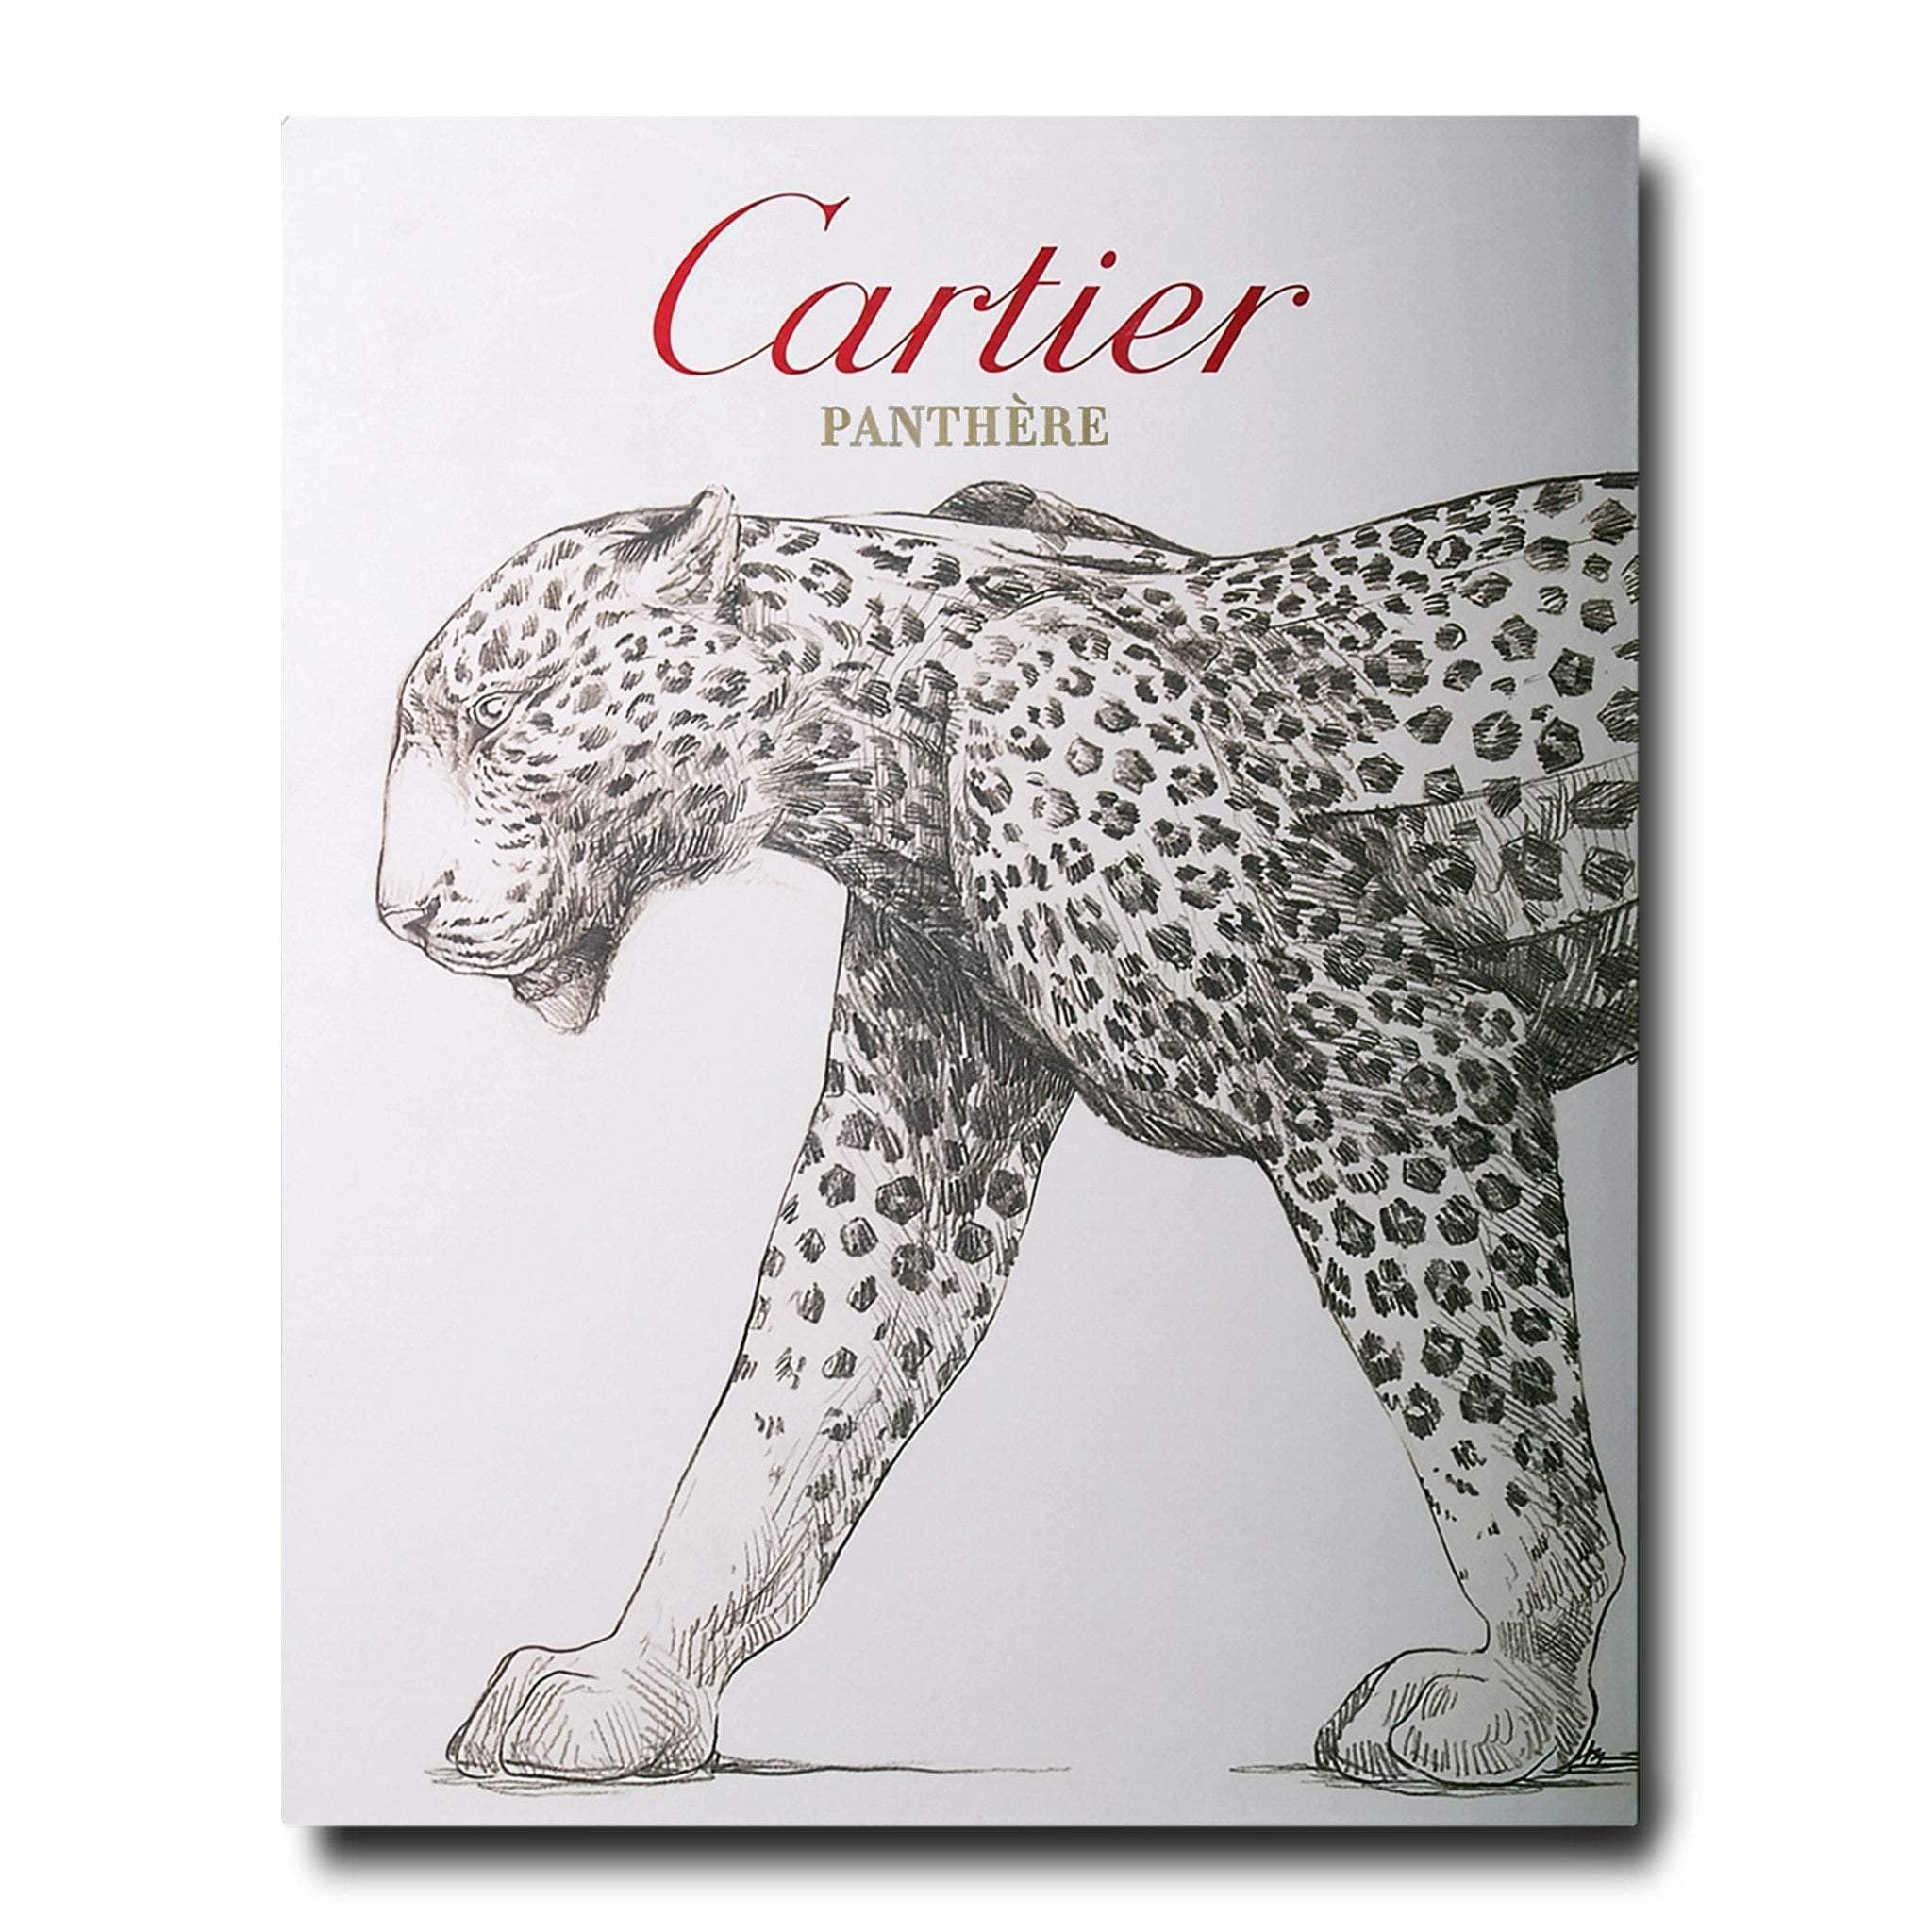 Cartier Panthere Legends Becker Vivienne 9781614284284 Amazon Com Books